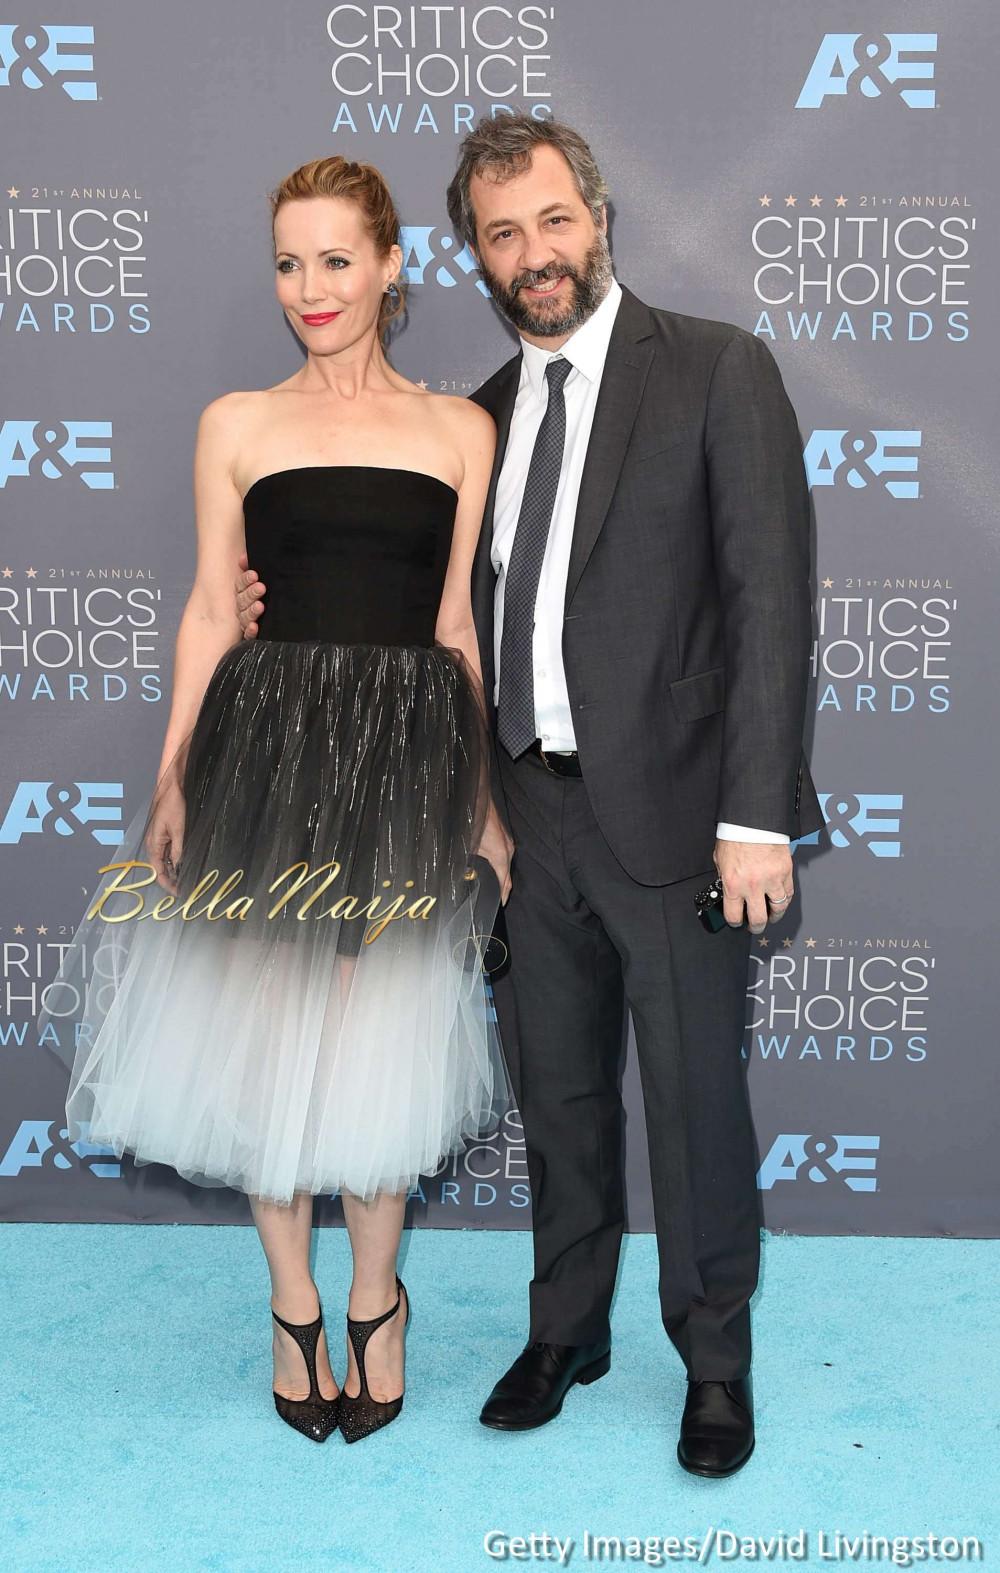 Leslie Mann & Judd Apatow